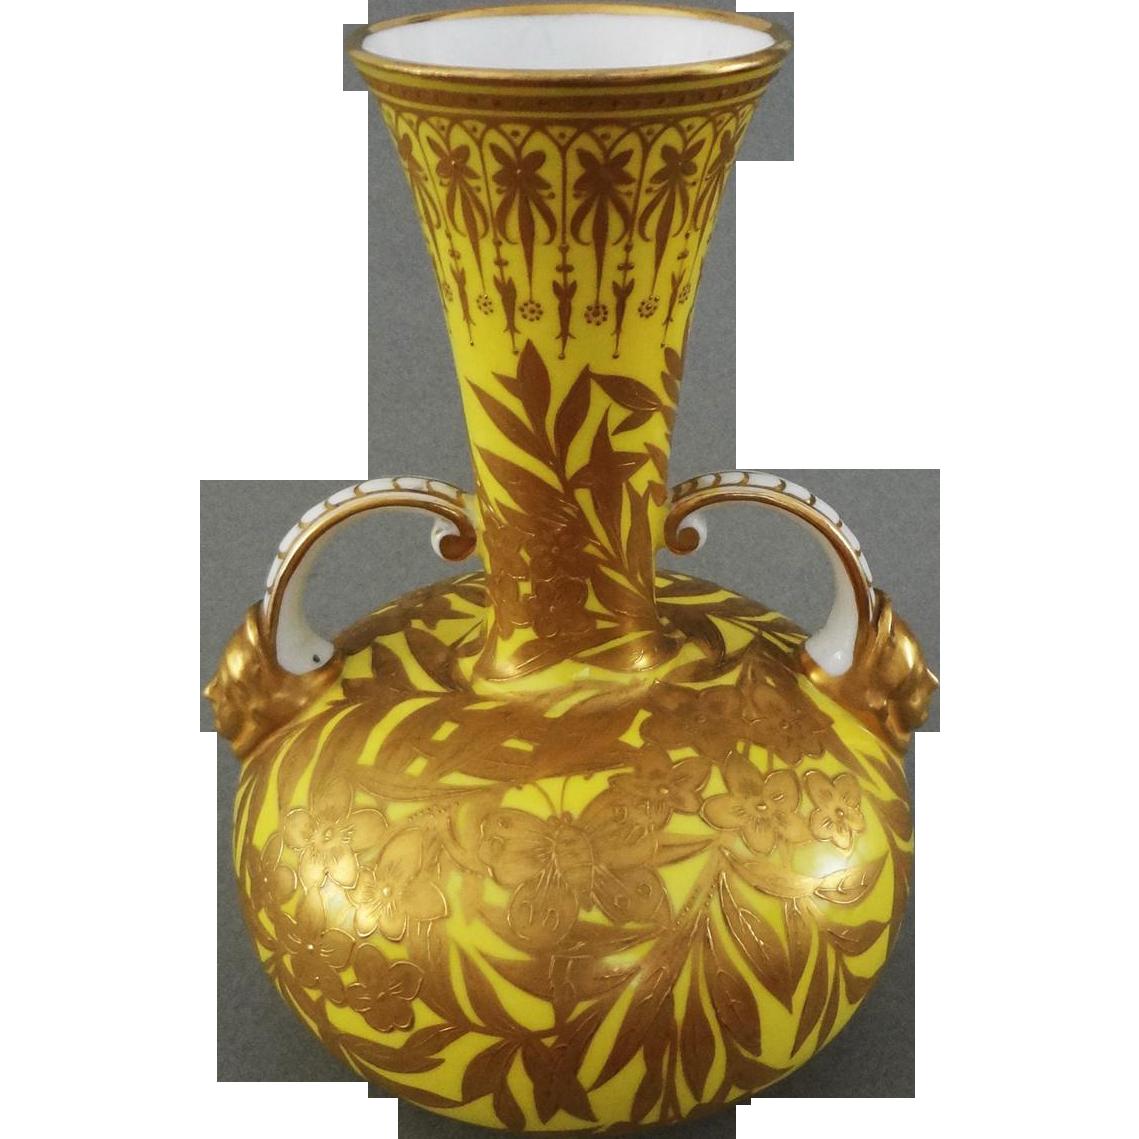 Royal crown derby large yellow raised gilt handled vase urn royal crown derby large yellow raised gilt handled vase urn amulet art and antiques ruby lane reviewsmspy